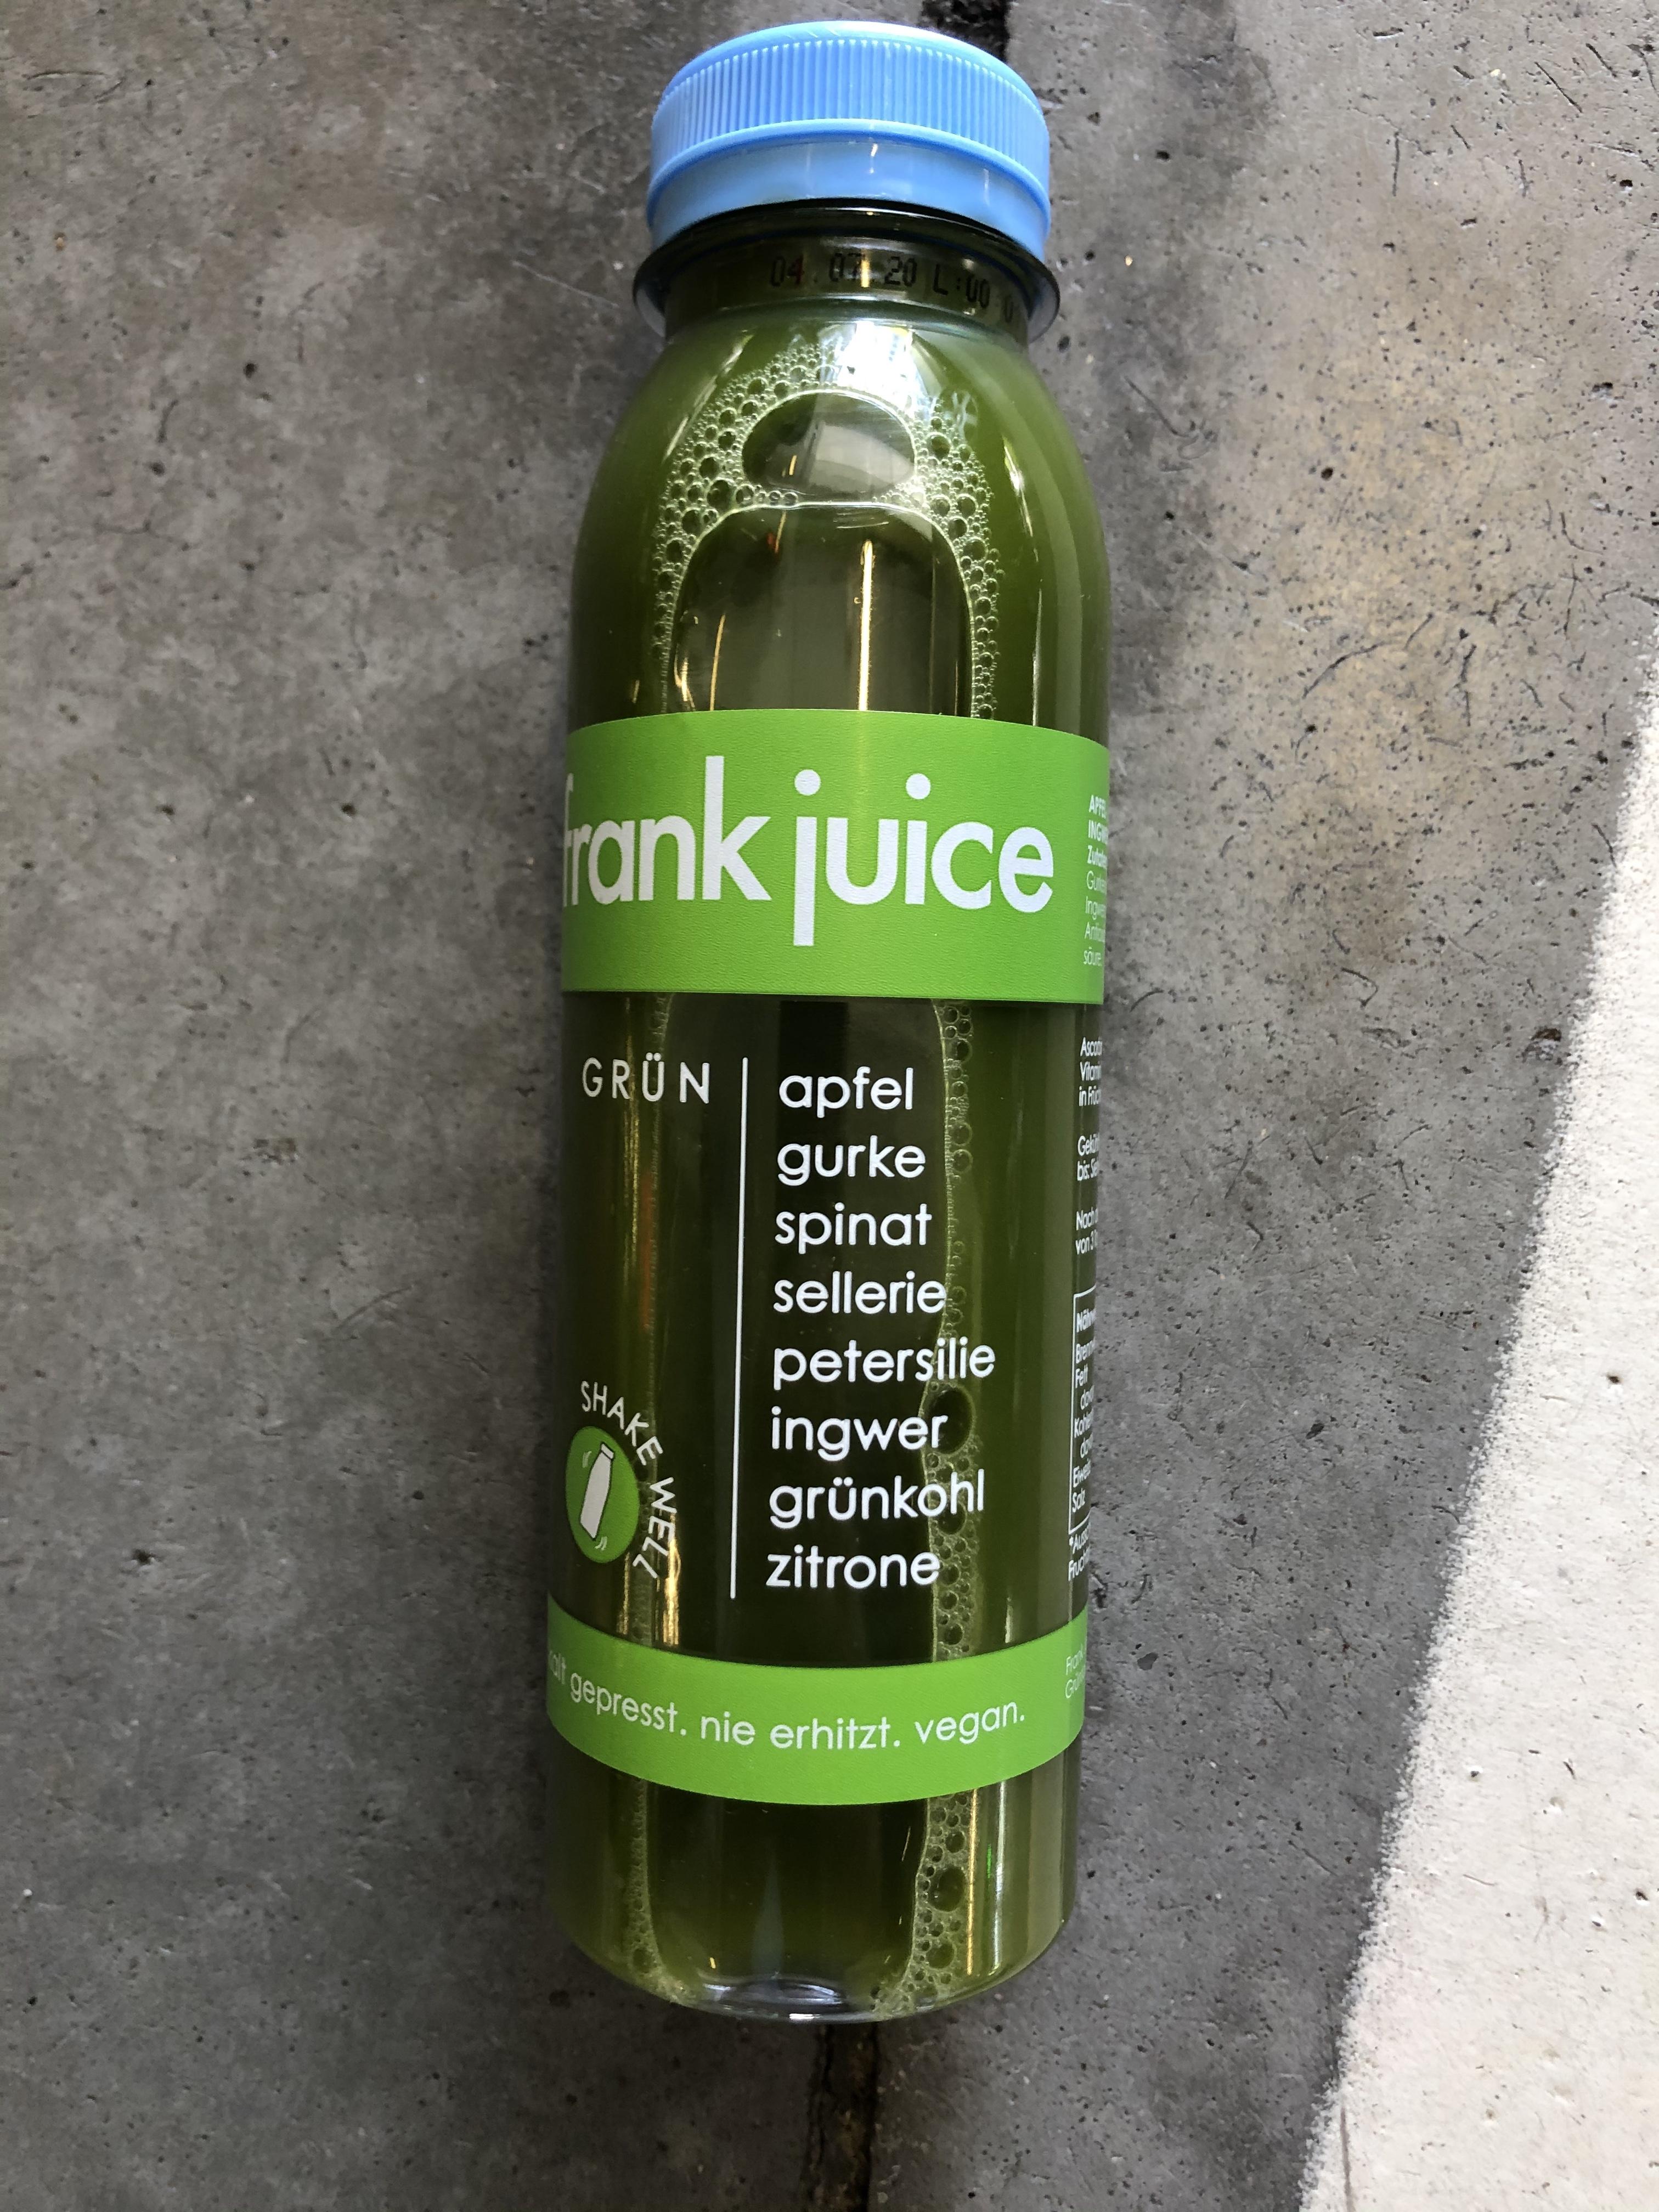 Produktrueckruf Frank Juice Gruen 330Ml